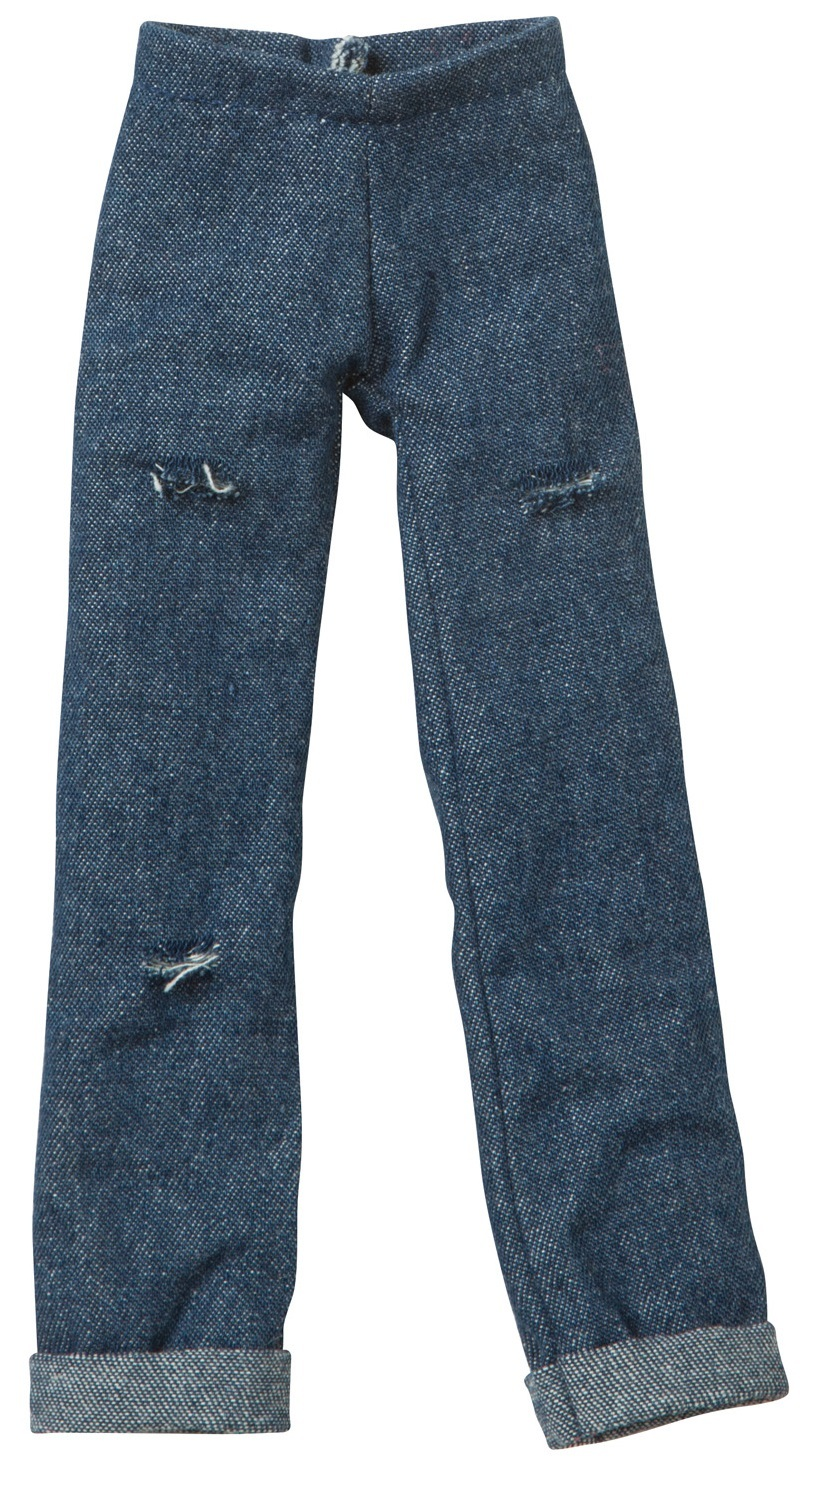 S.C.O.U.T. Tree Climbing Skinny Jeans